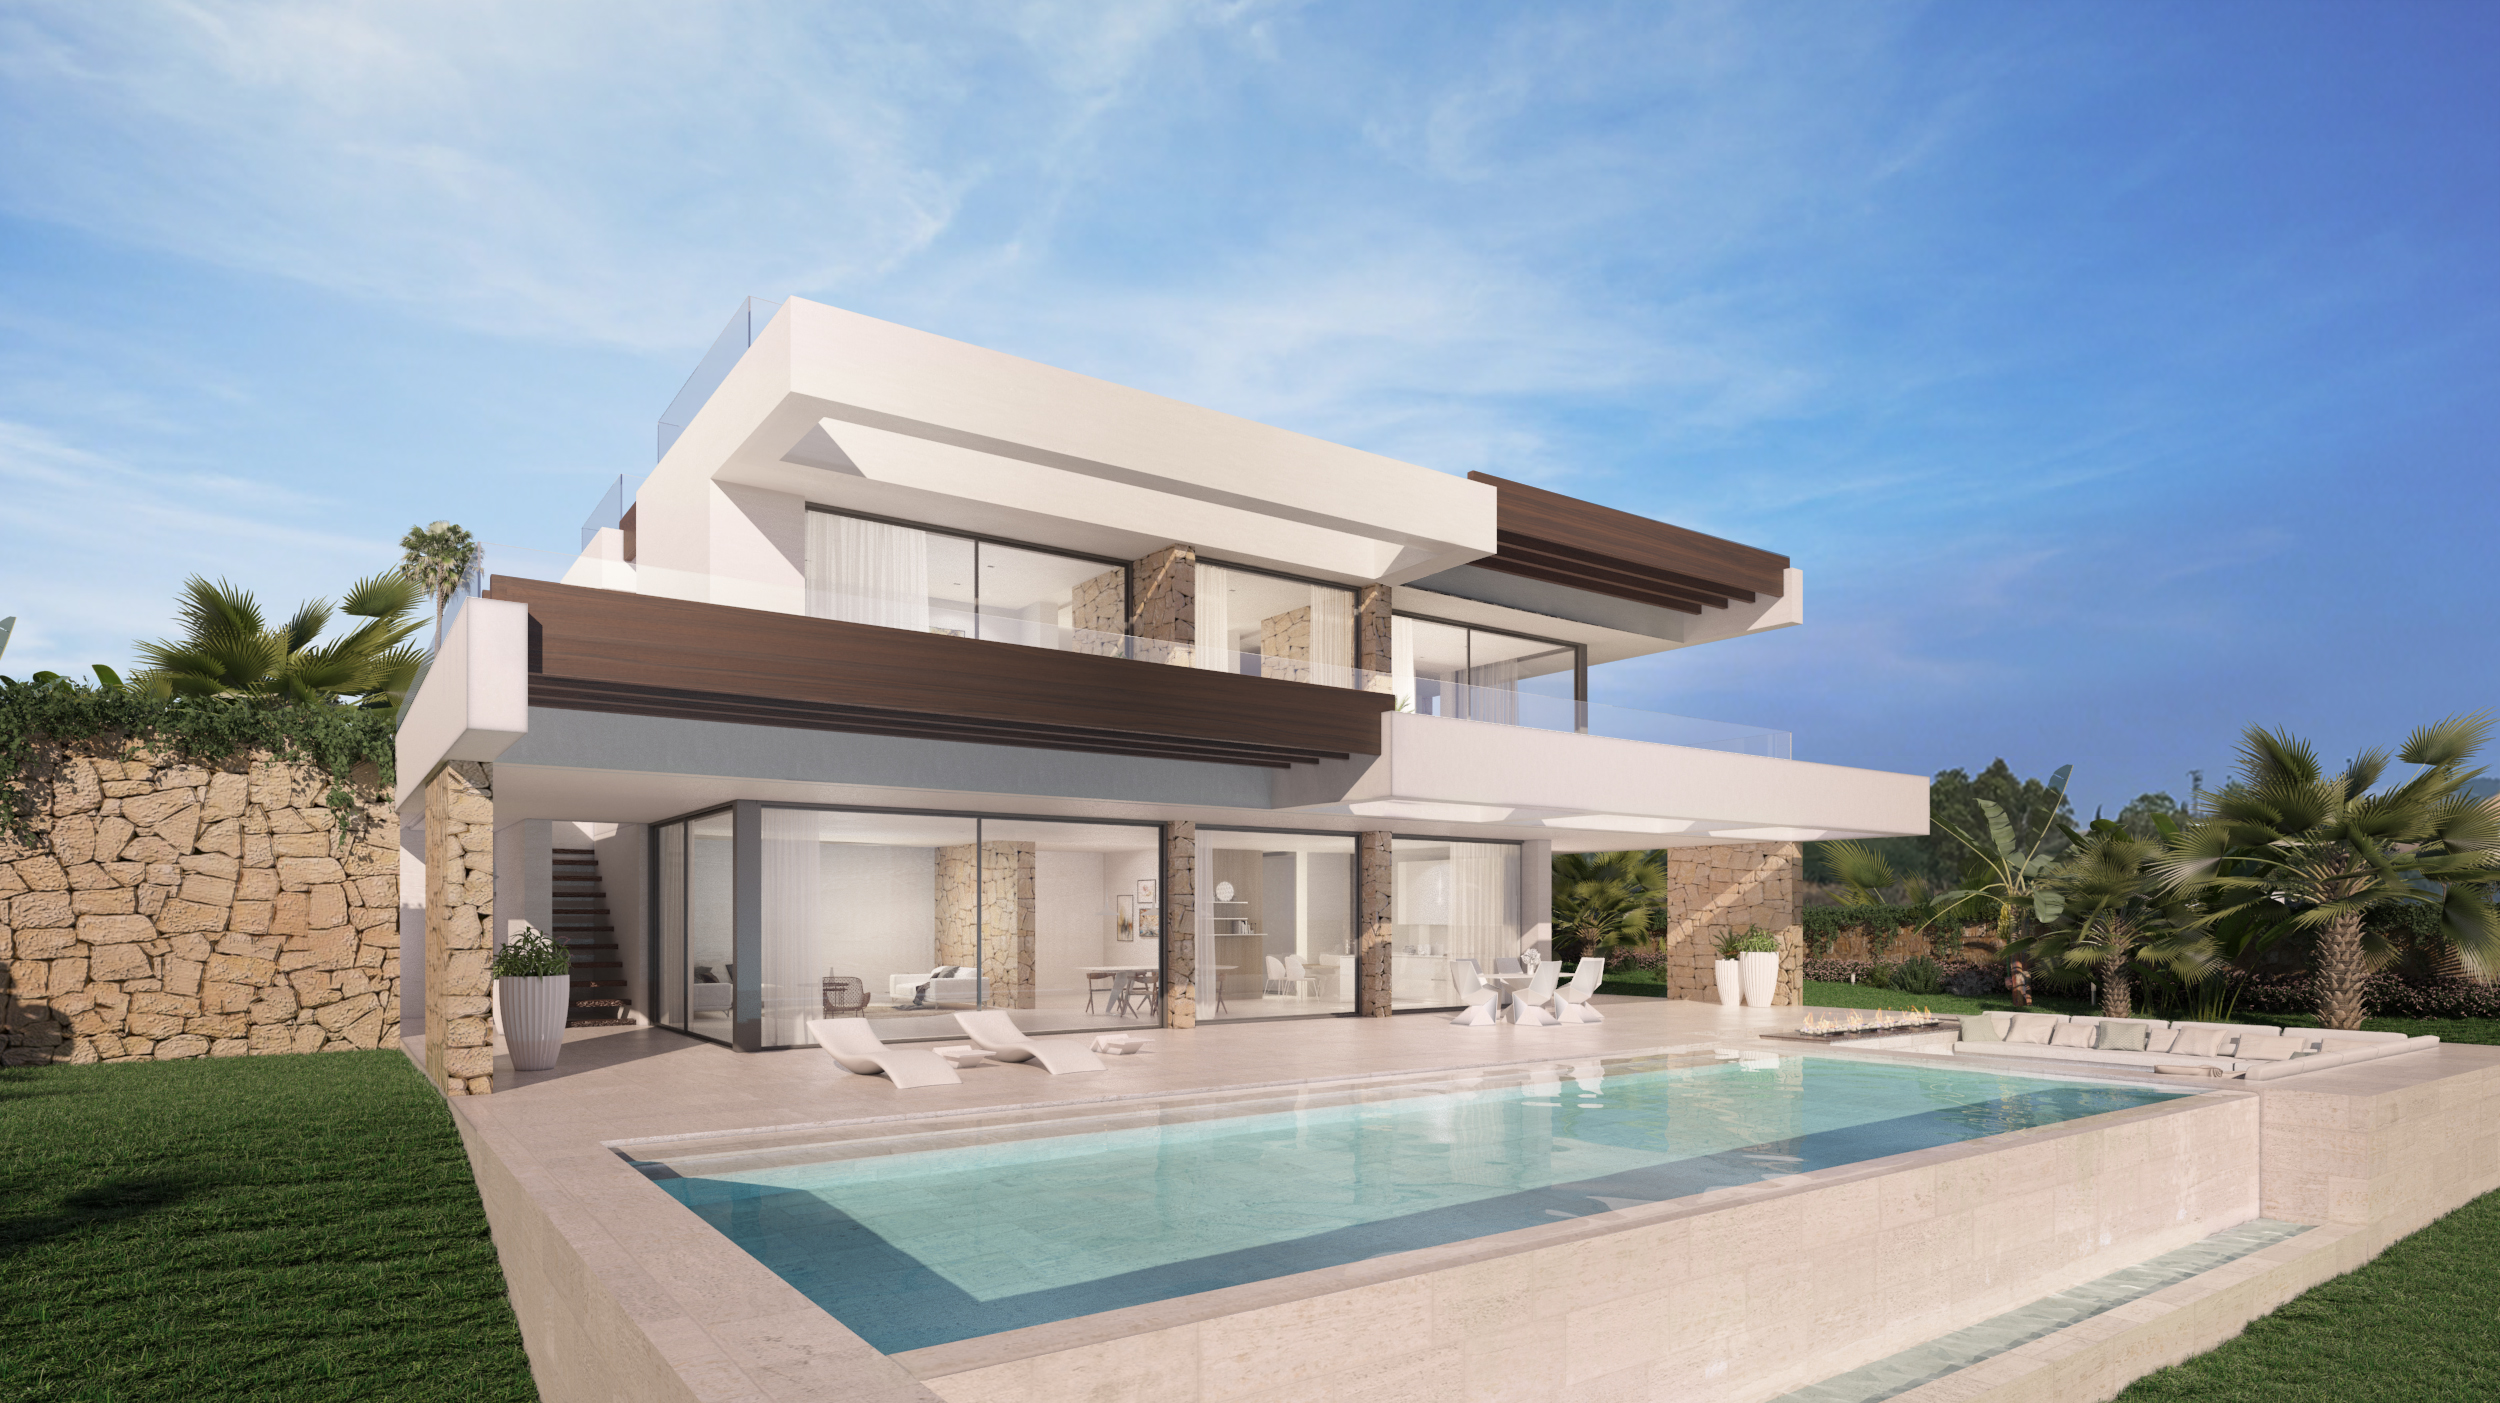 Nieuwbouw in Elviria (Spanje, Costa del Sol)